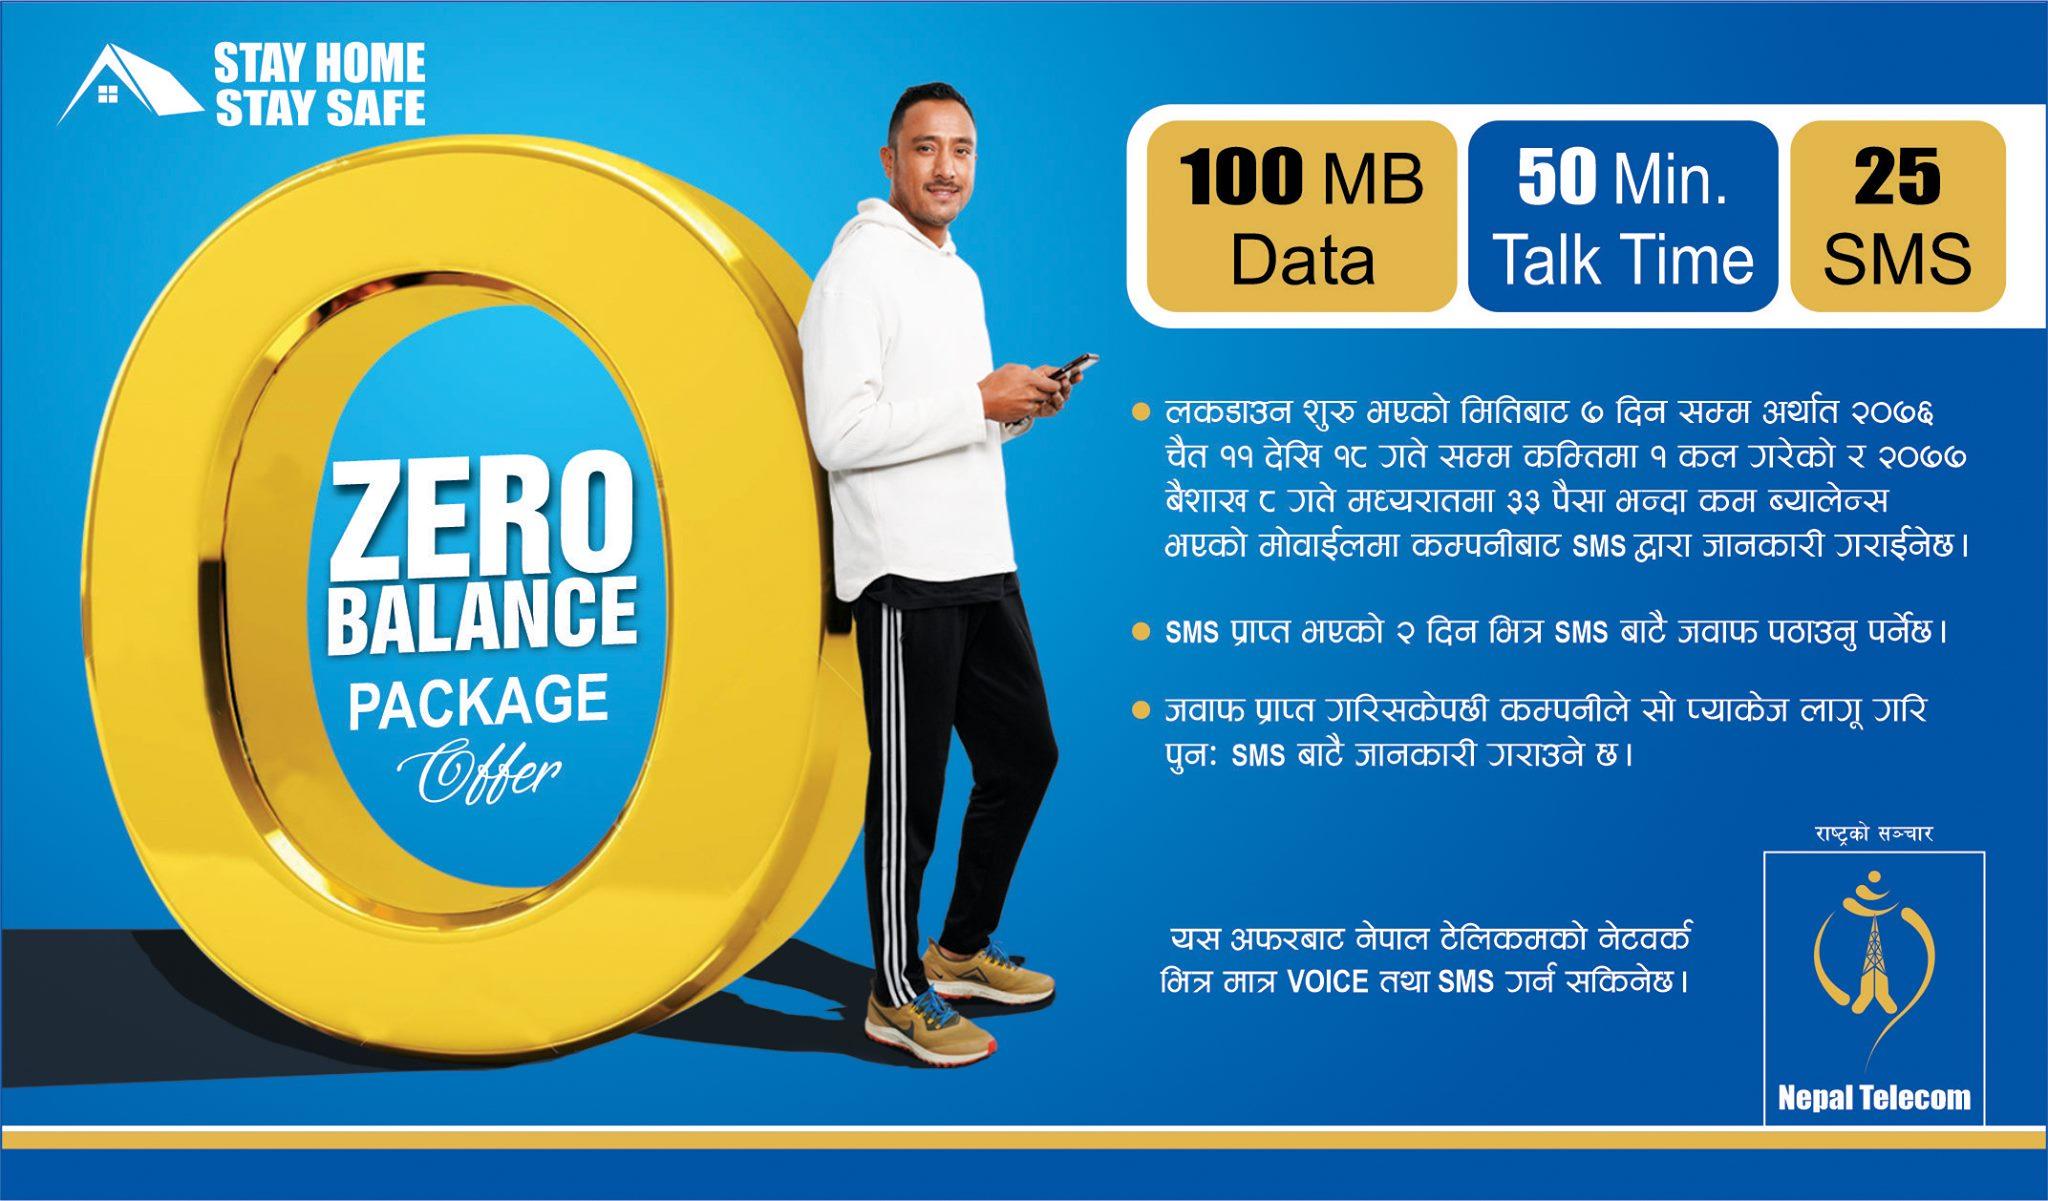 nepal telecom zero balance package offer